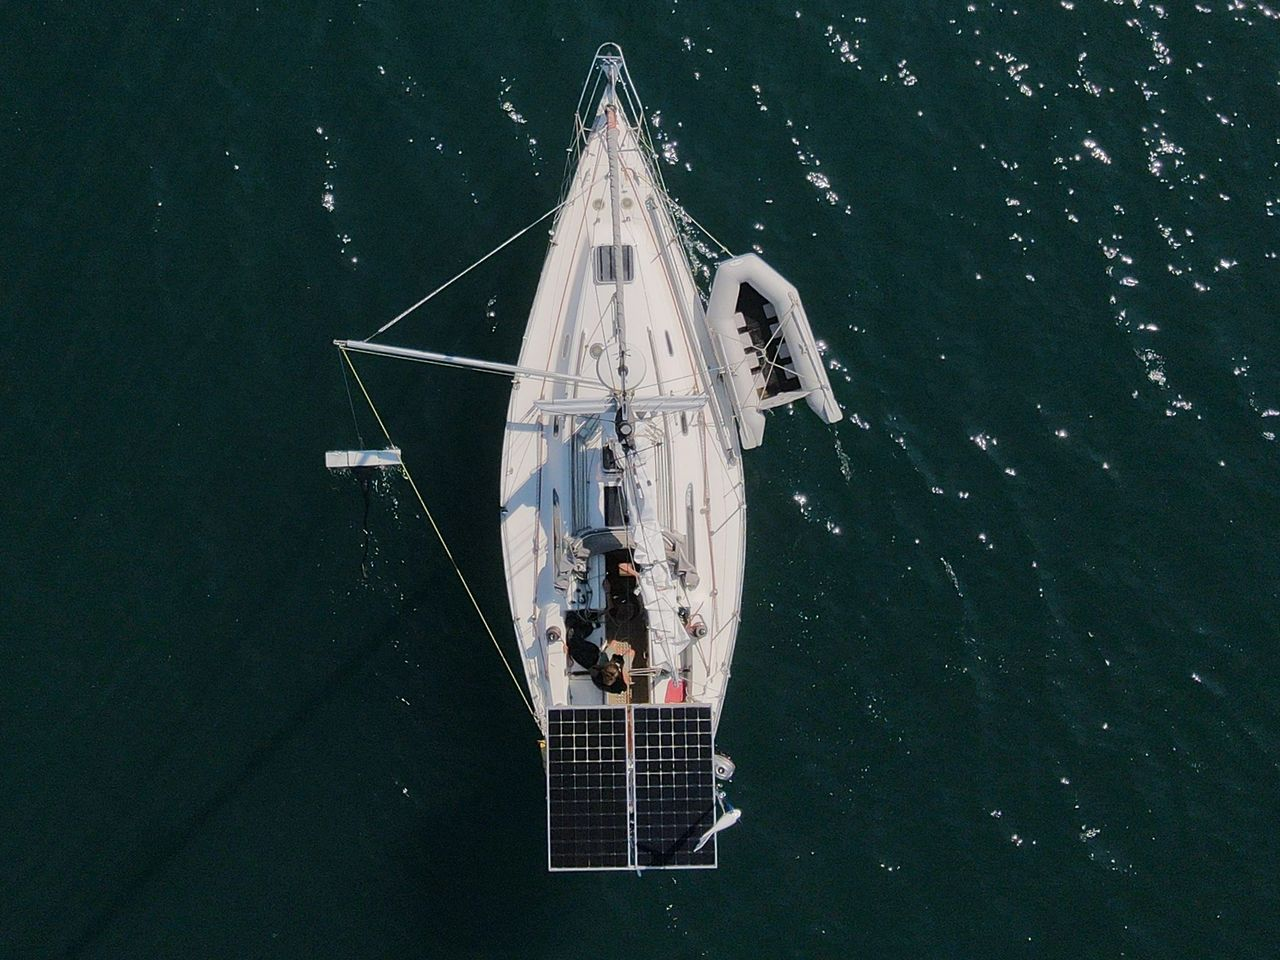 Microplastics surveying with SV Nazca - North Devon Marine project